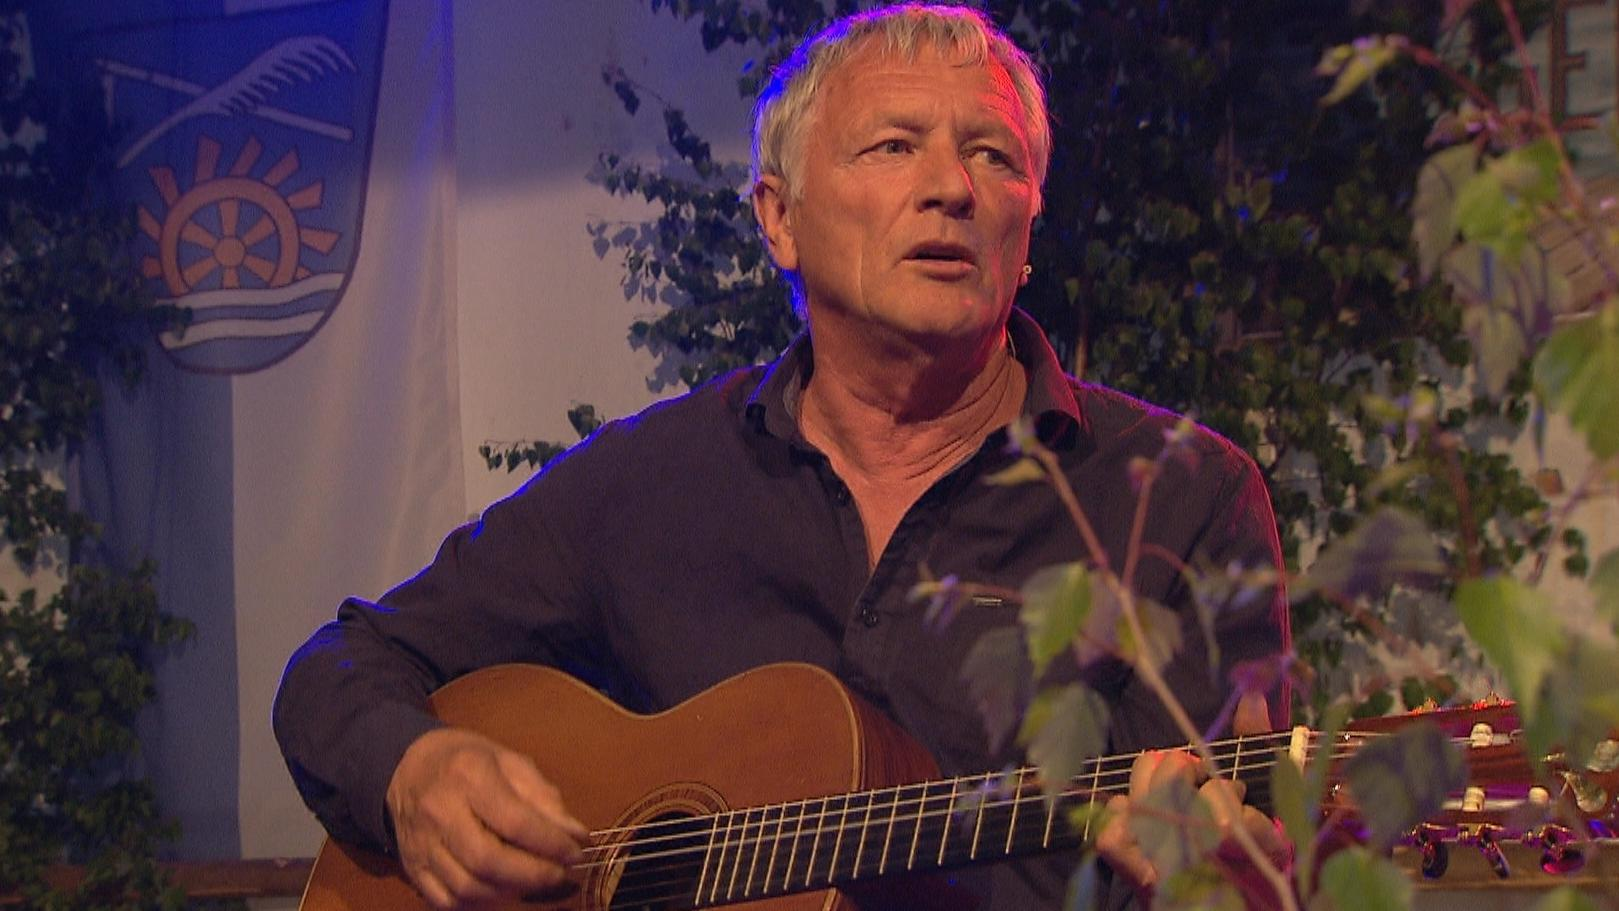 Josef Brustmann spielt Gitarre